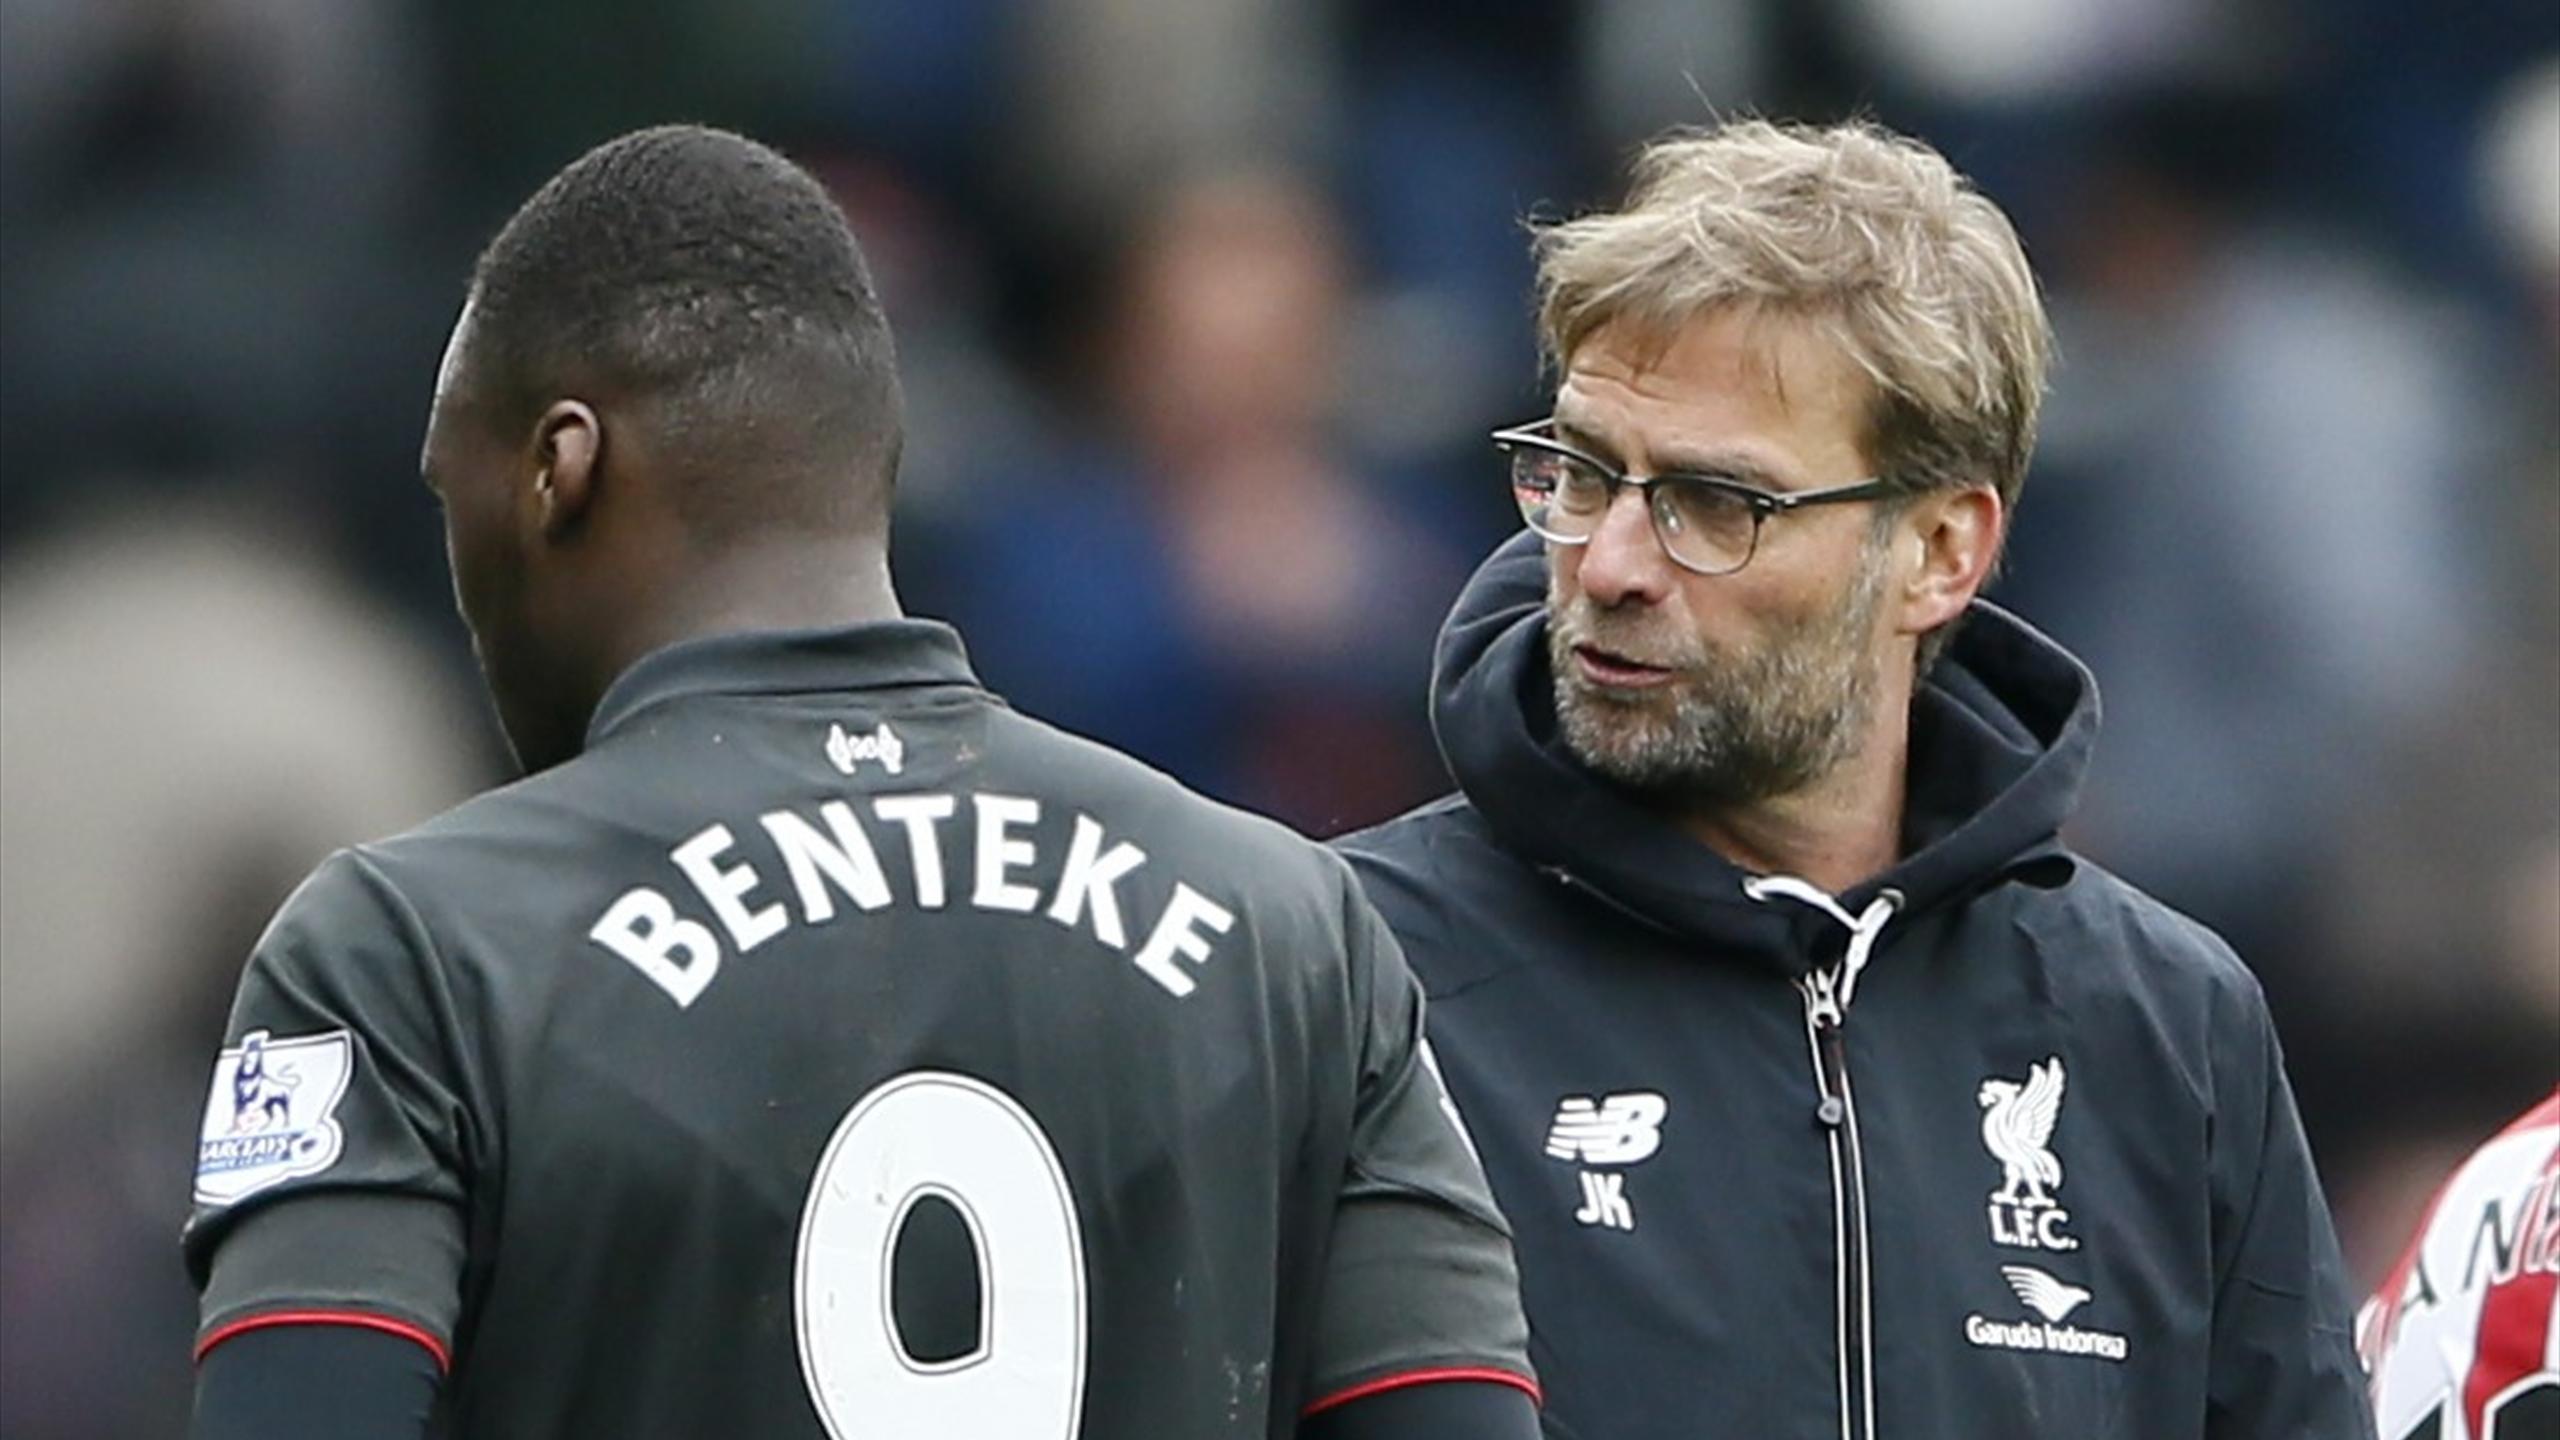 Liverpool manager Jurgen Klopp with Christian Benteke